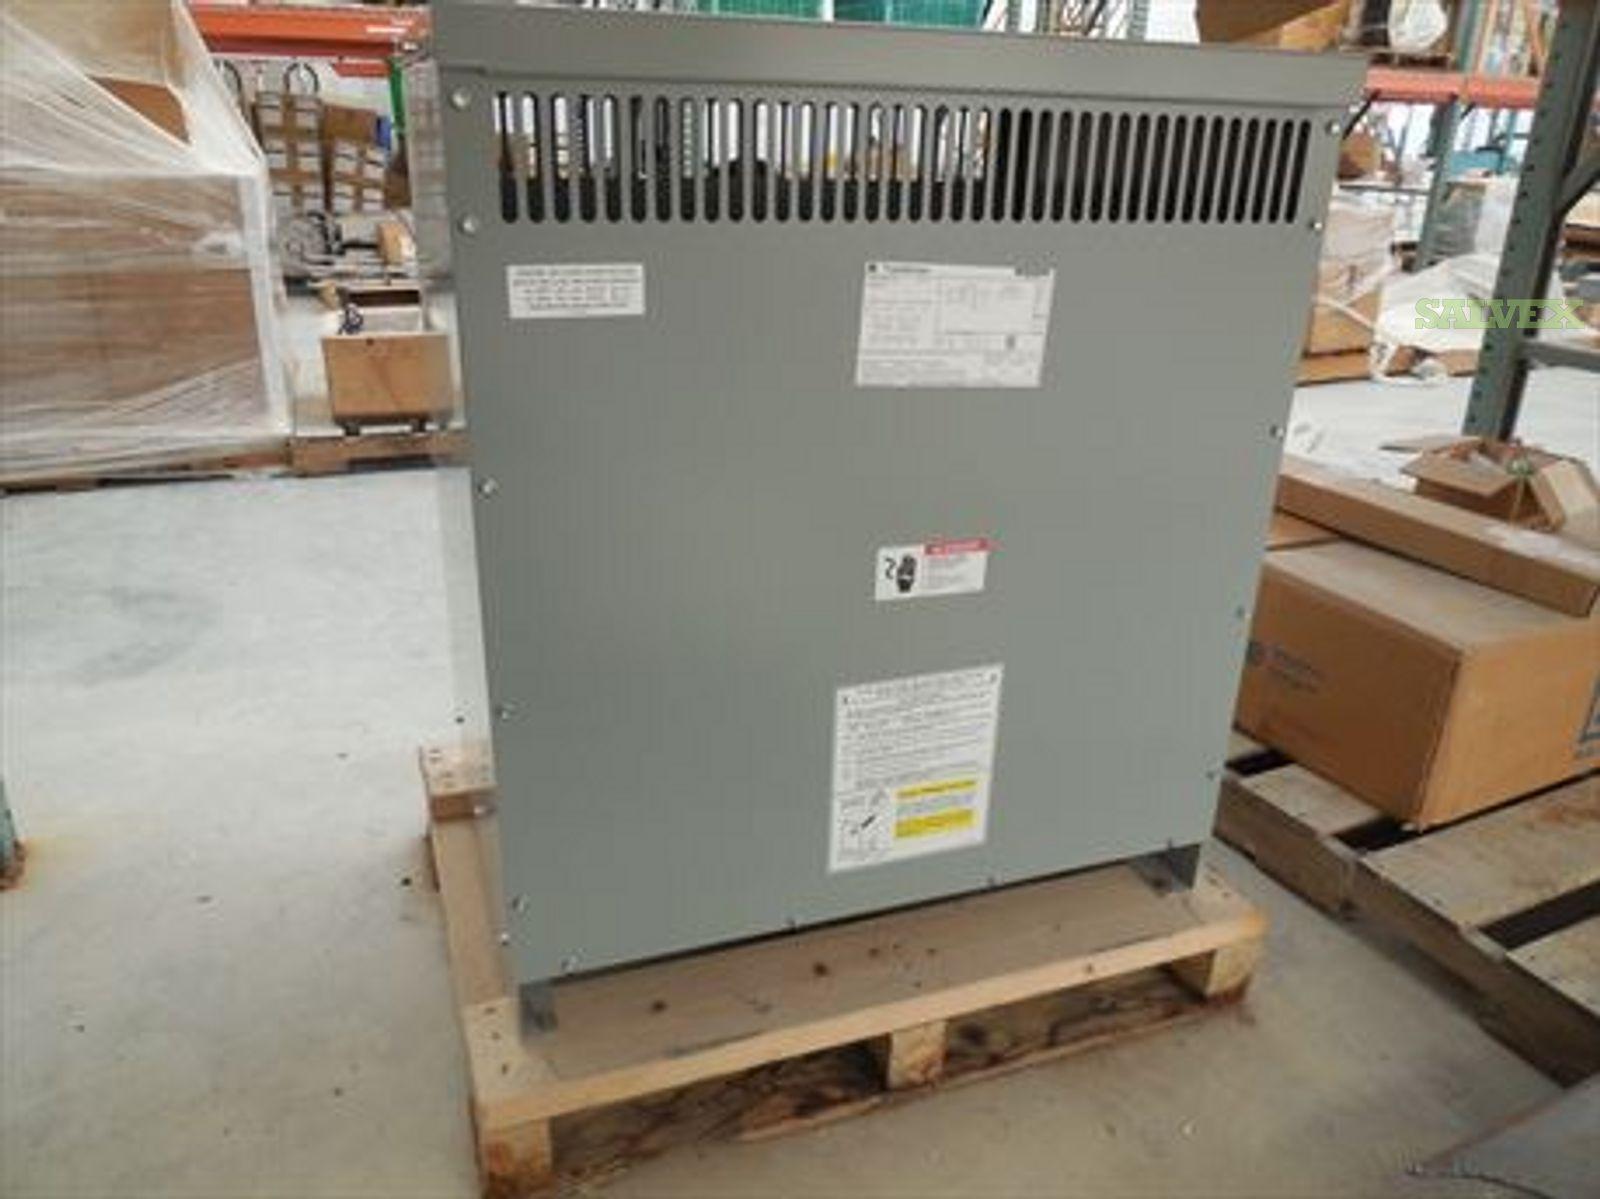 GE 37.5 KVA Dry Transformer - Never Used (1 Unit)